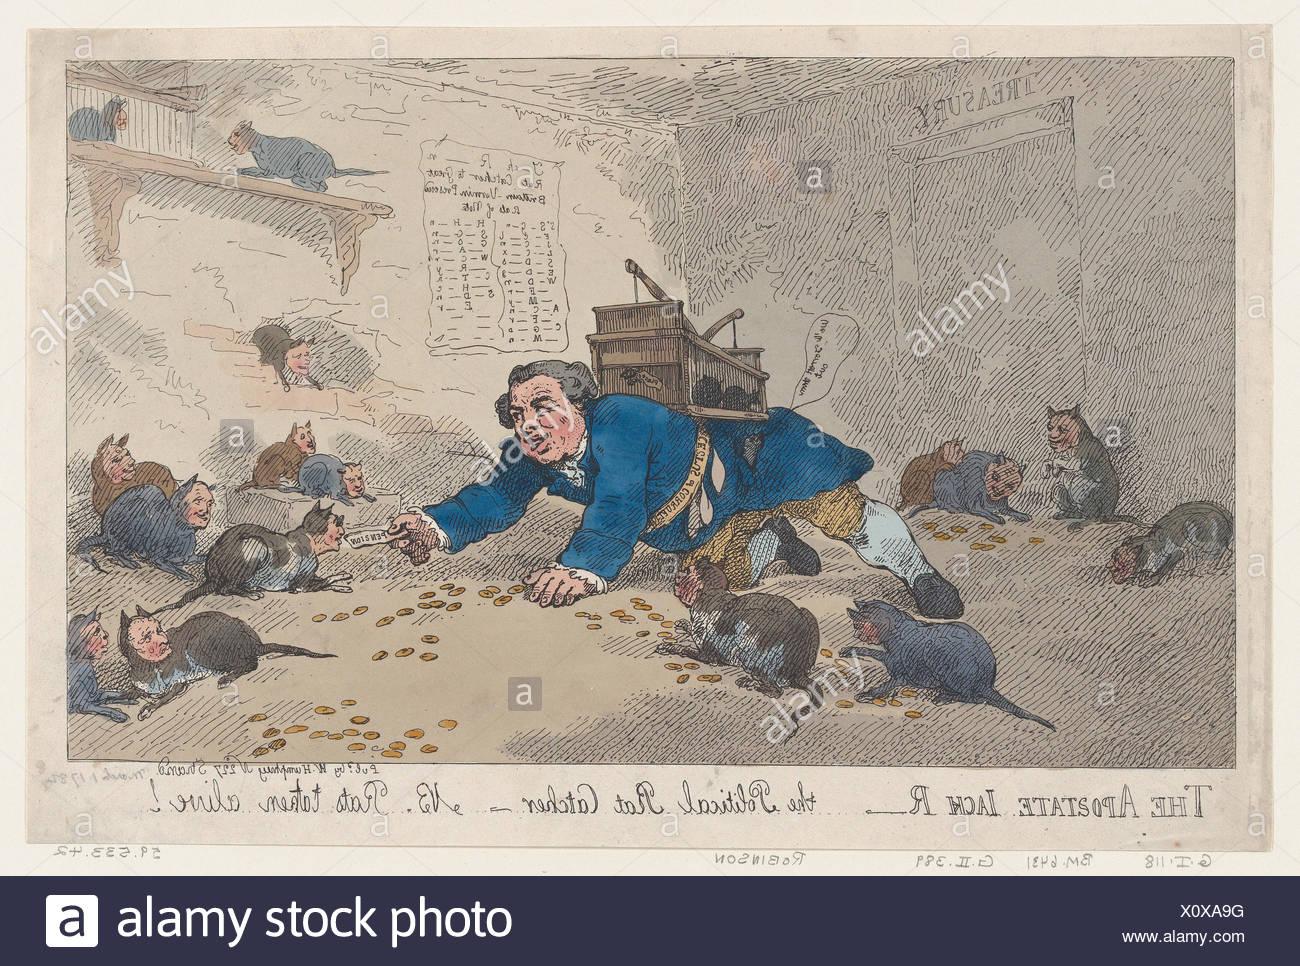 The Apostate Jack Robinson, The Political Rat Catcher-N.B. Rats Taken Alive!. Artist: Thomas Rowlandson (British, London 1757-1827 London); - Stock Image